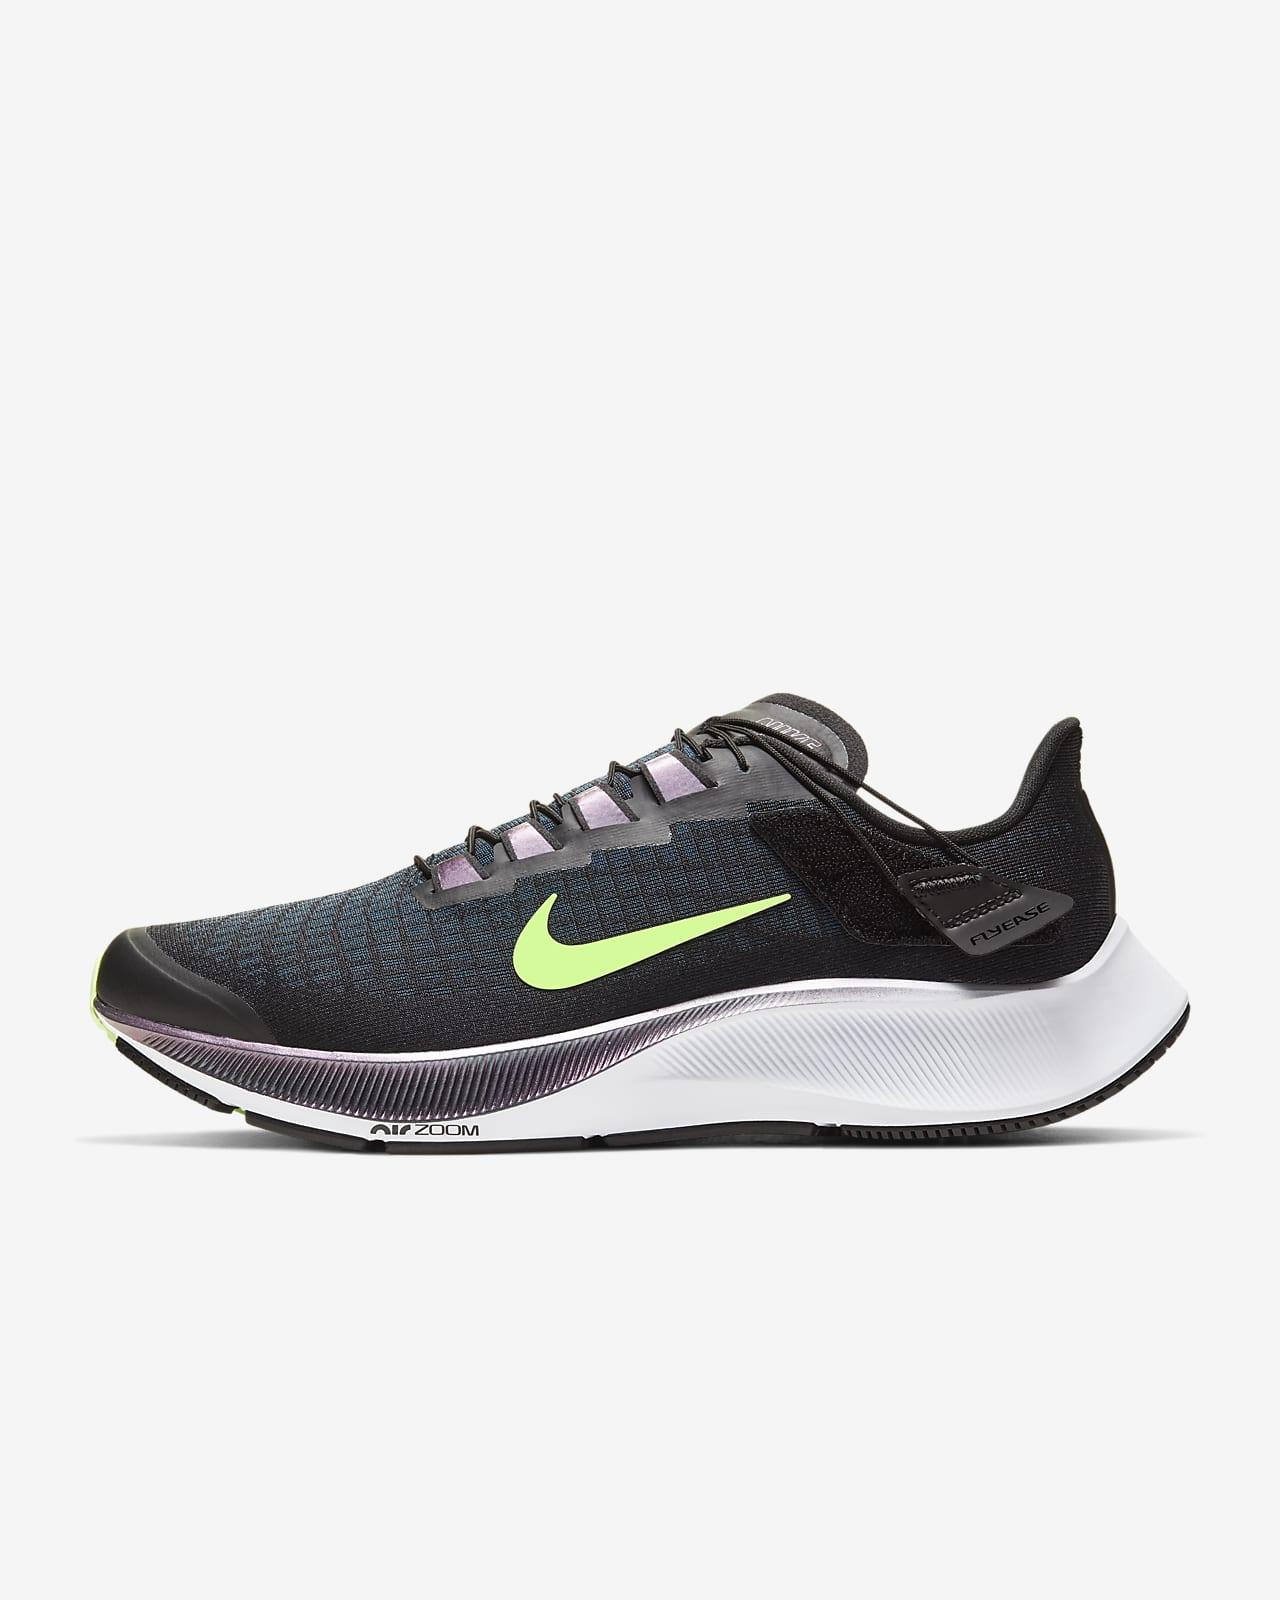 Nike Air Zoom Pegasus 37 FlyEase Men's